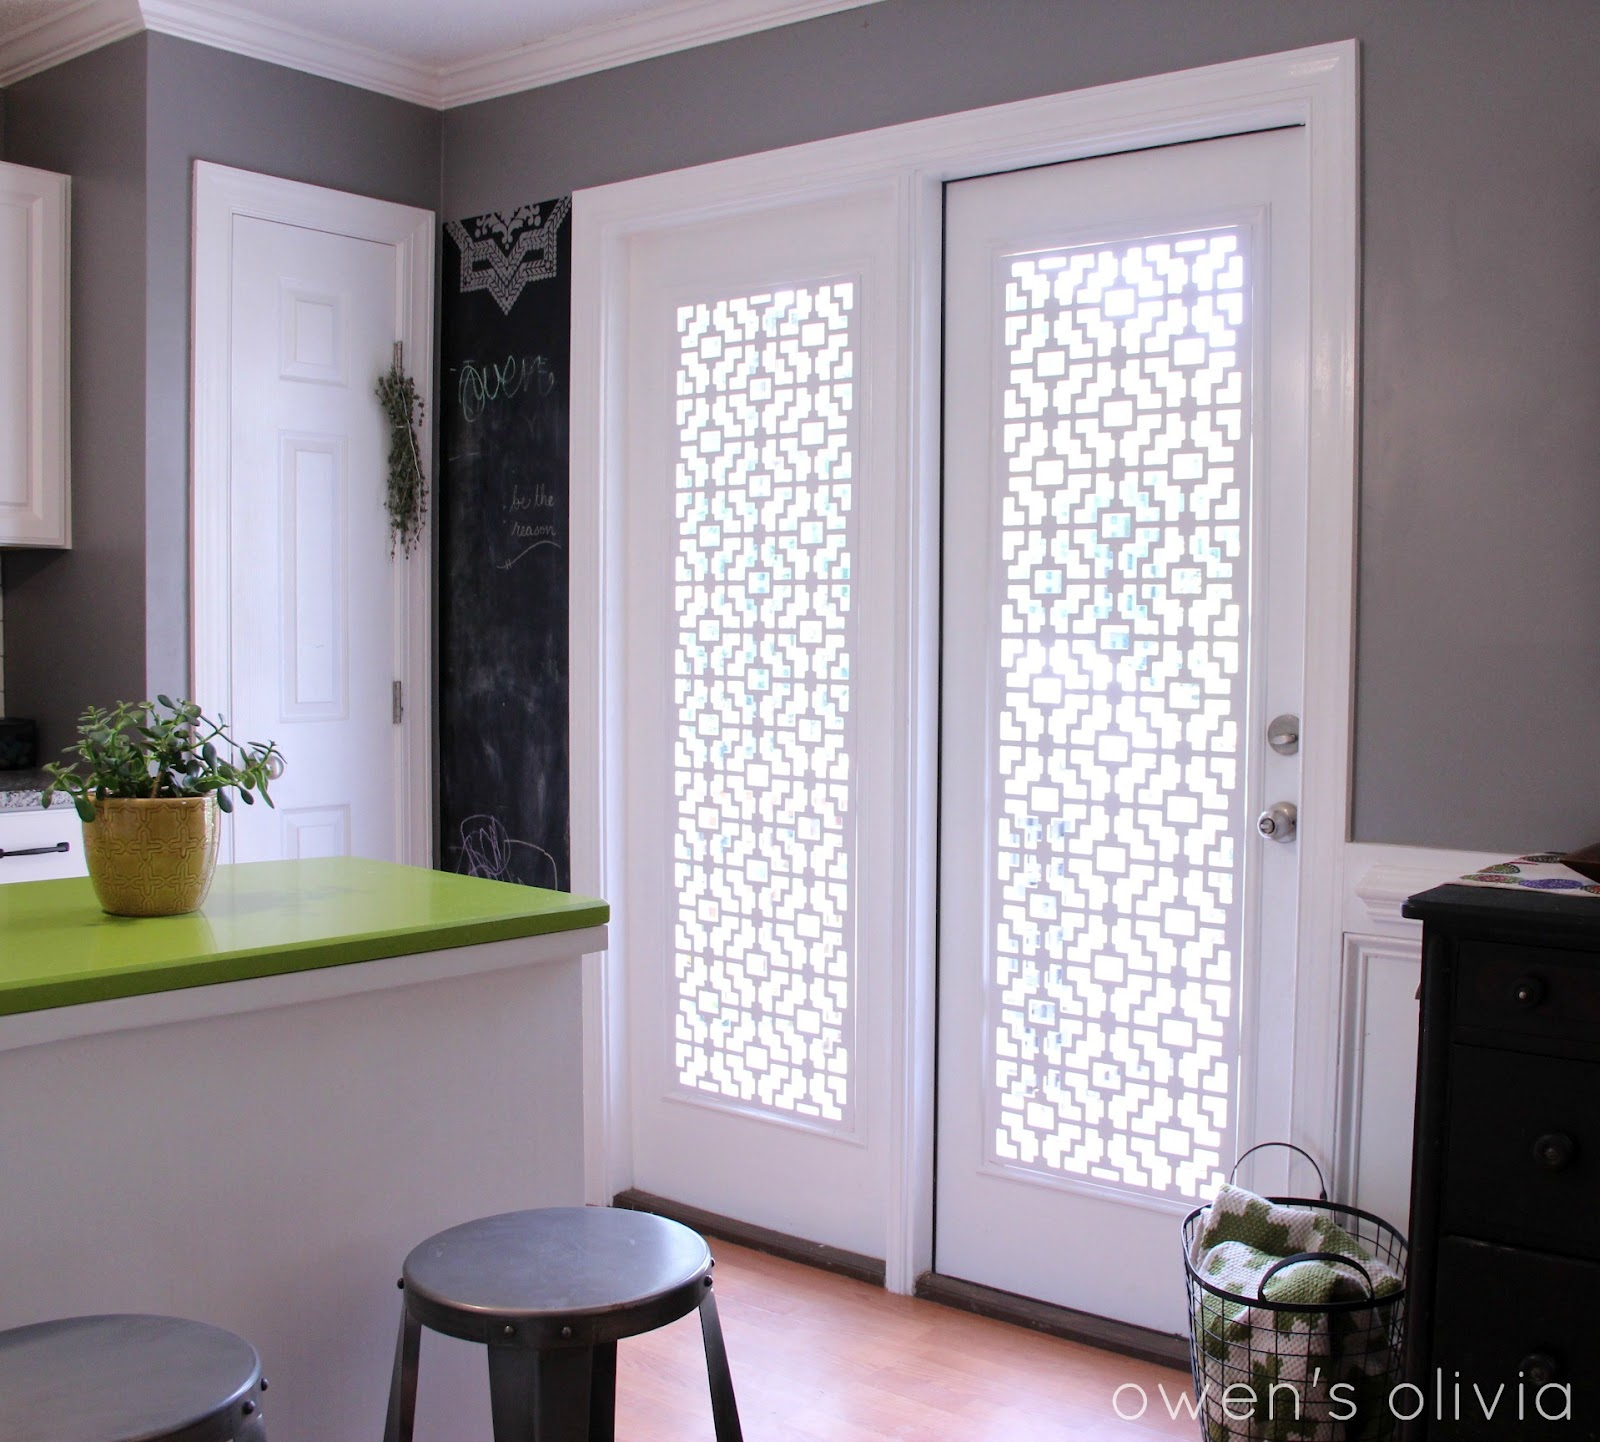 owen's olivia: Custom Window Treatments Using PVC